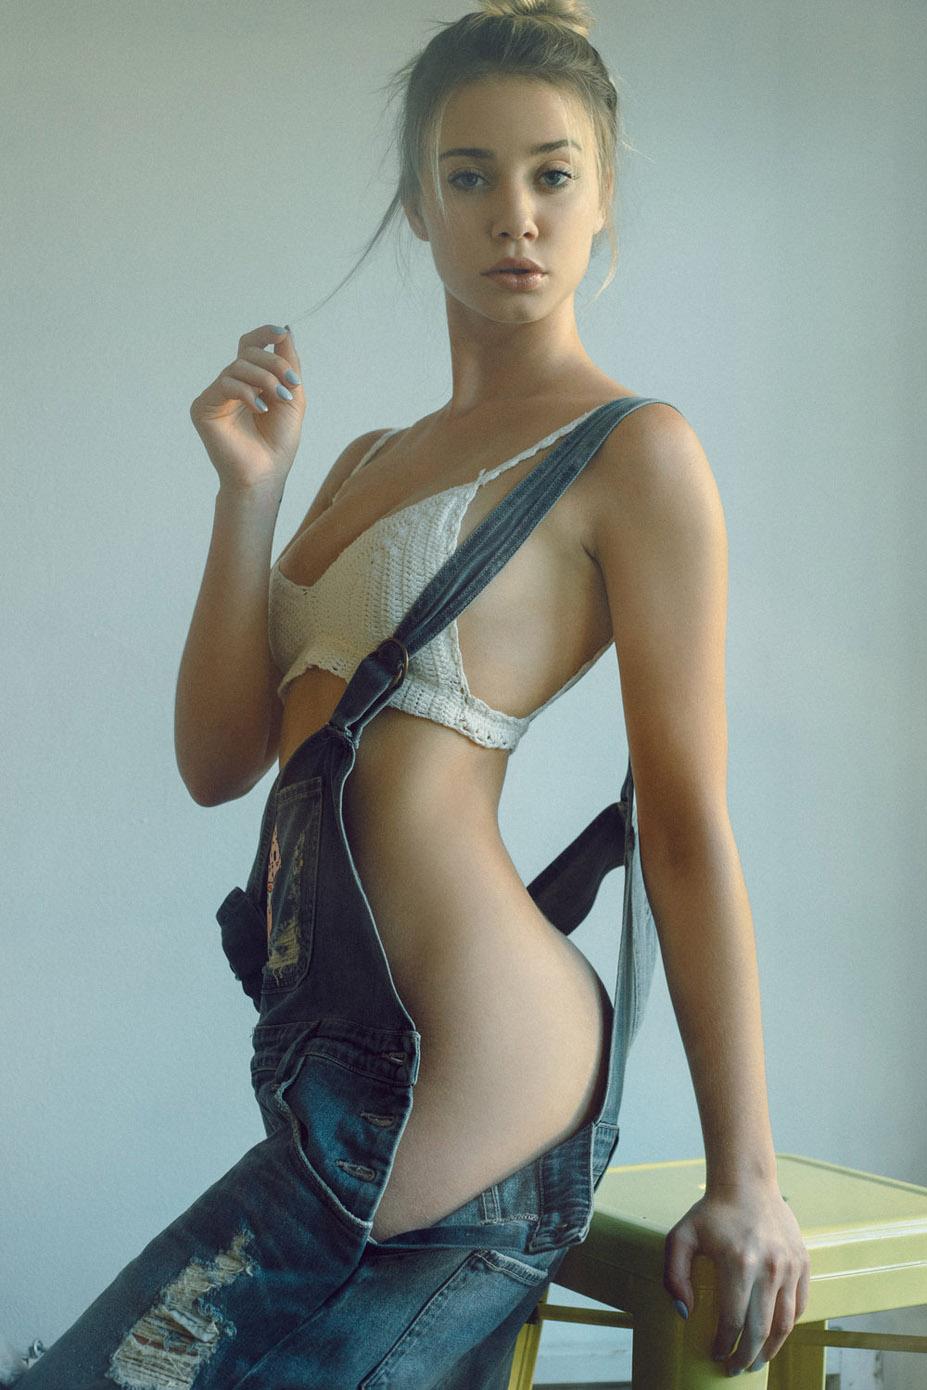 пижамная вечеринка с девушкон Playboy Джози Огюст / Josey Auguste by Ben Tsui - Pajama Party